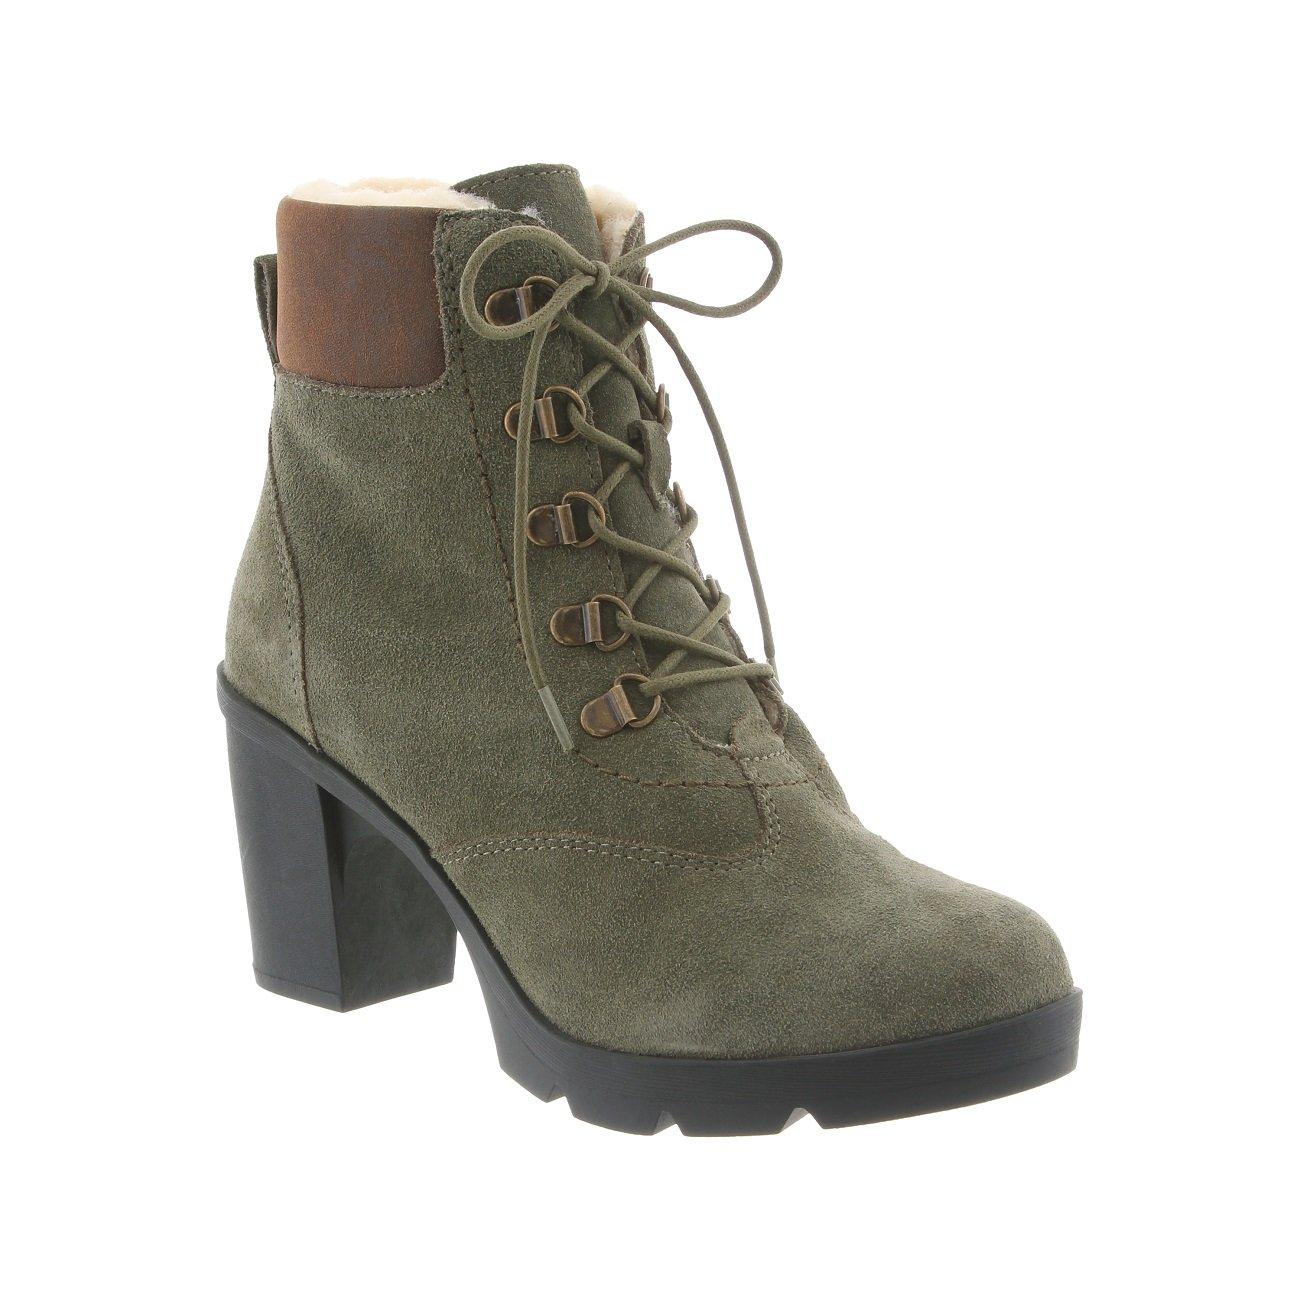 Bearpaw Marlowe Women's Boot B075BCHGQZ 8.5 B(M) US|Olive